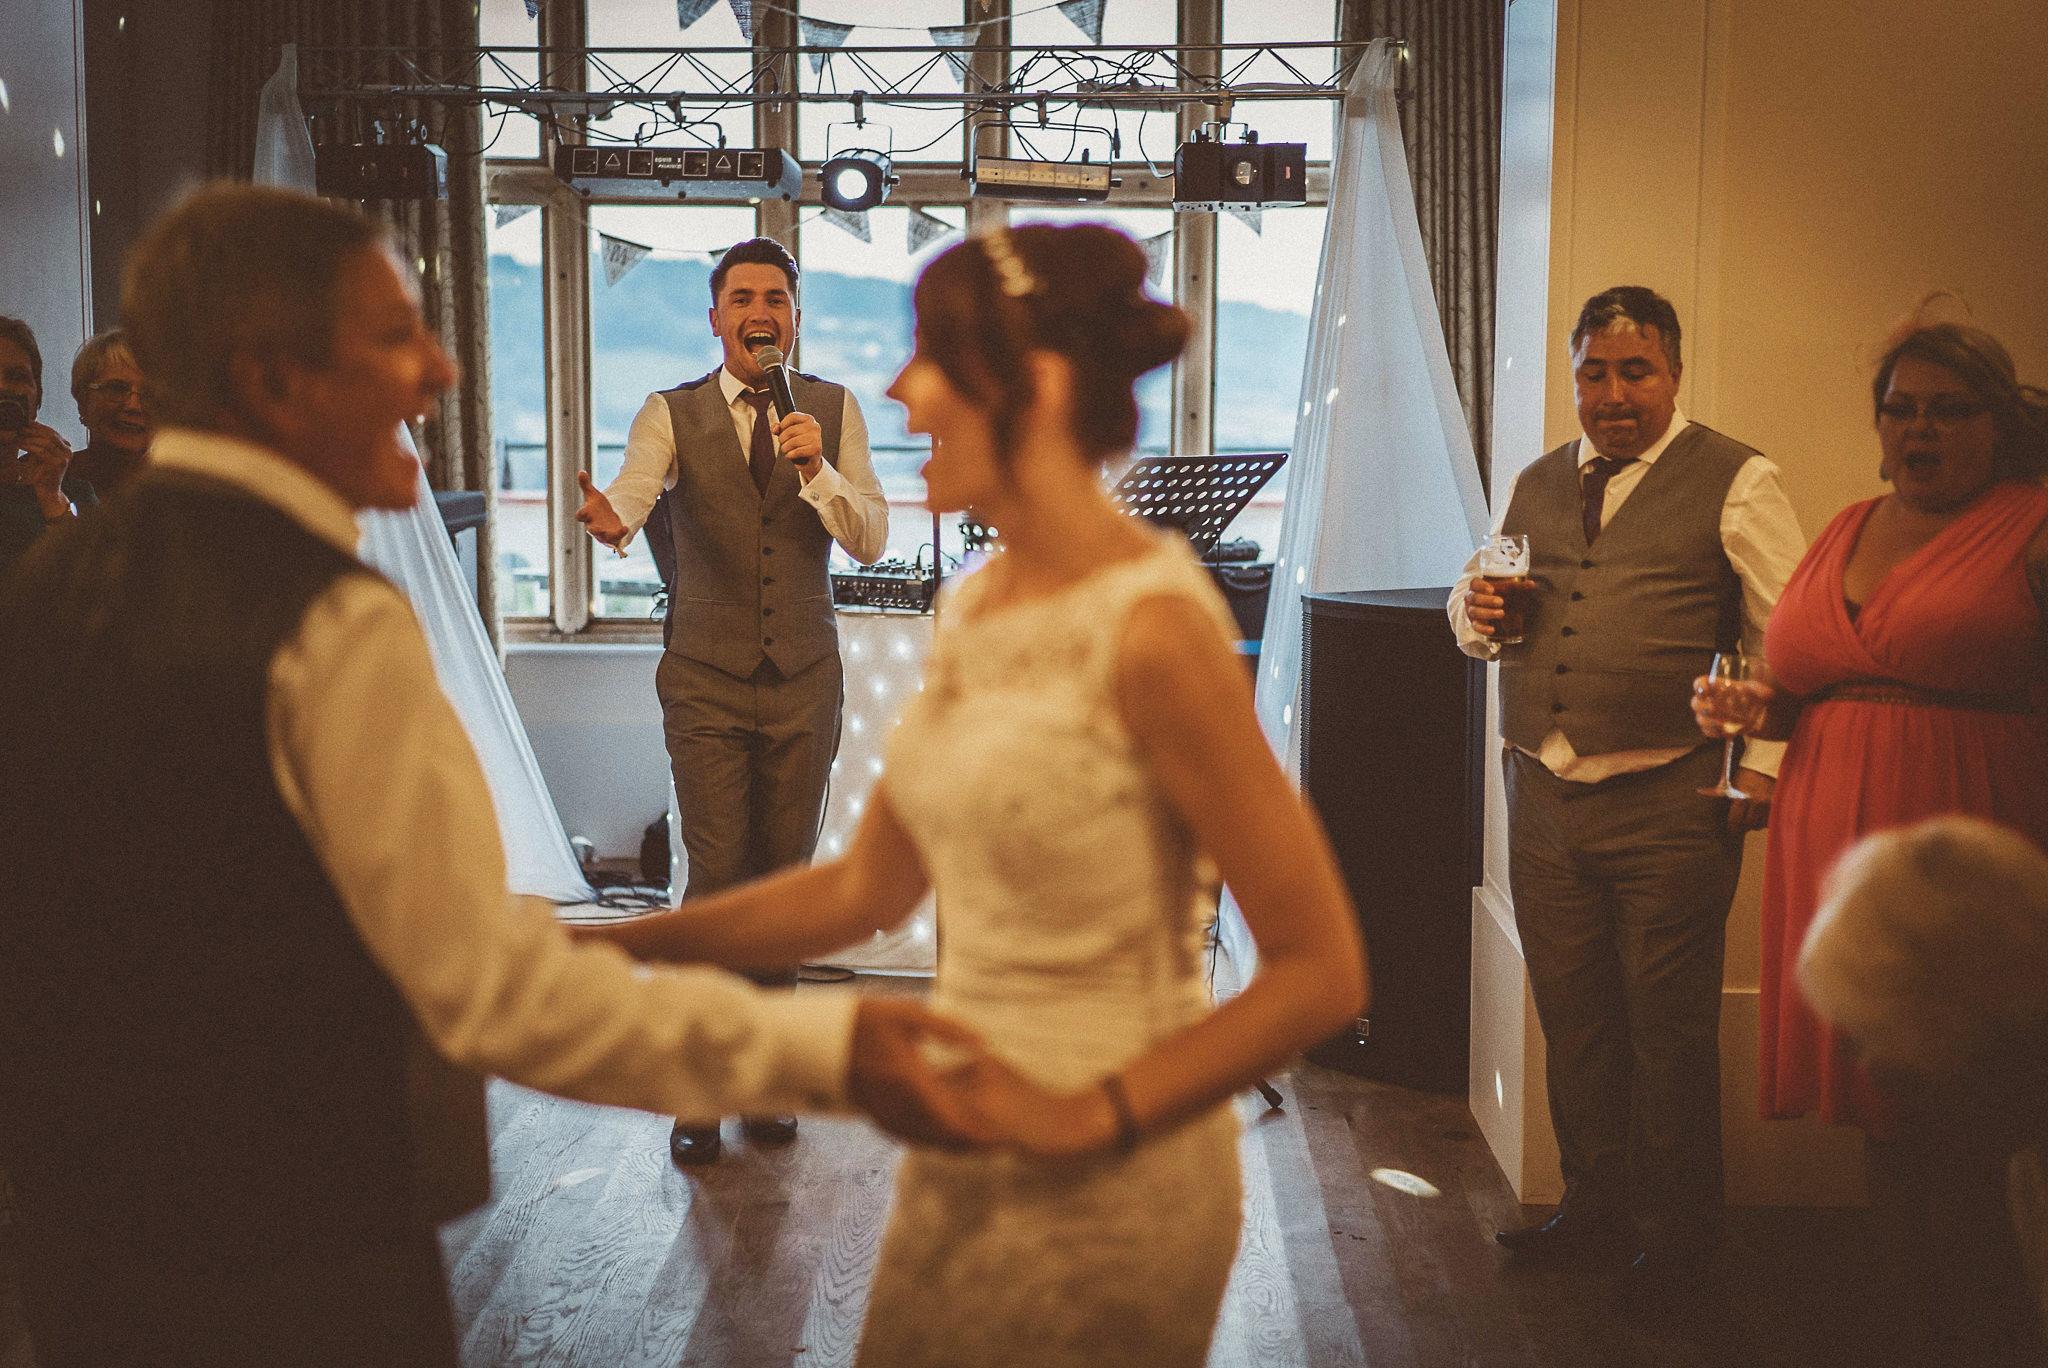 paul-marbrook-Caer-Llan-Wedding-Photographer-90095